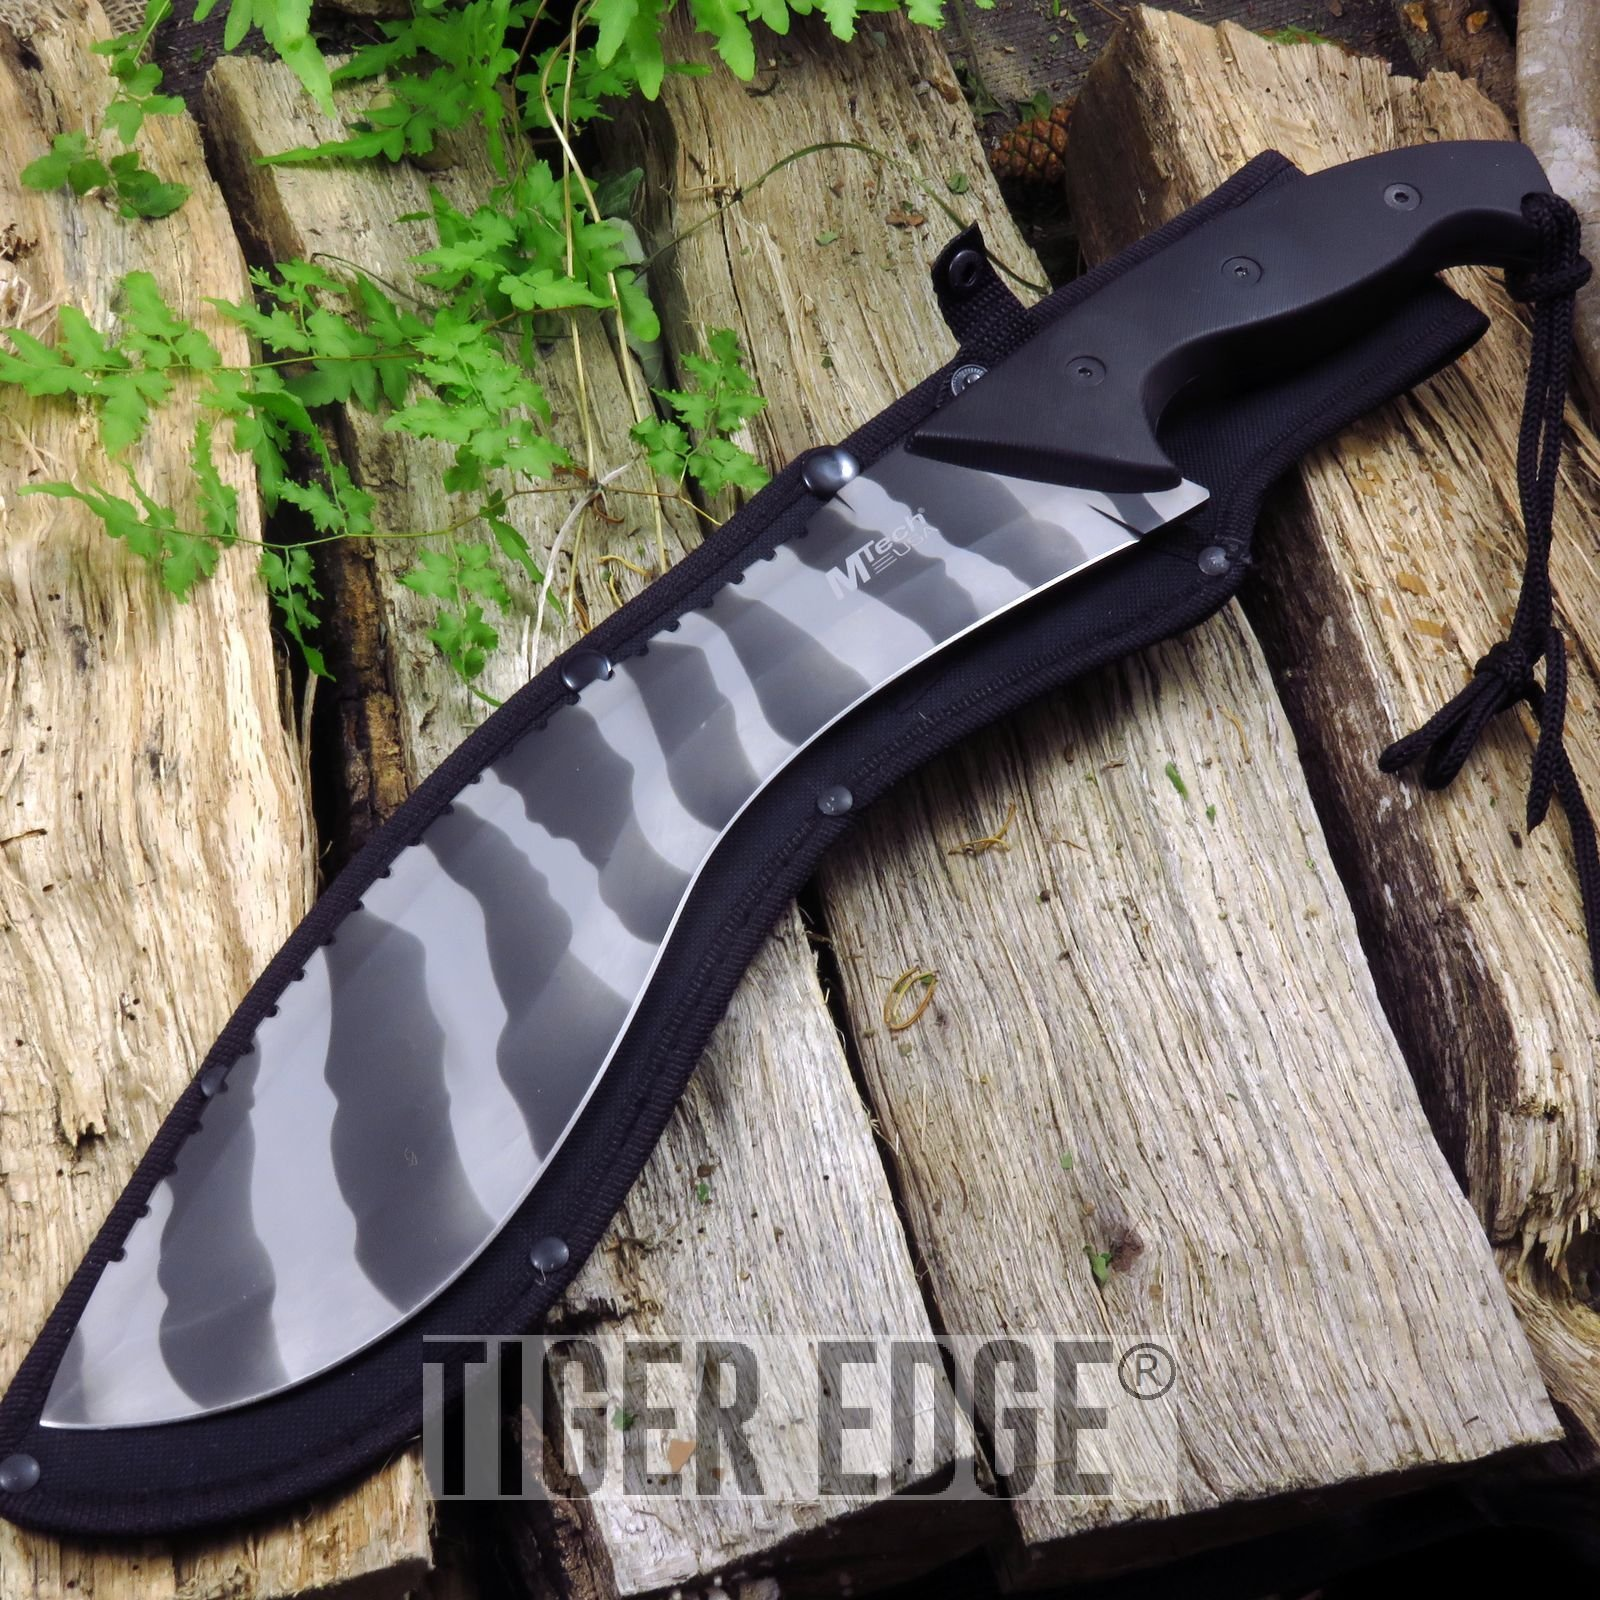 18.5'', 4.5mm Thick Urban Camo Heavy Kukri Machete with Carbon Sharp Blade Durable w/ Sheath